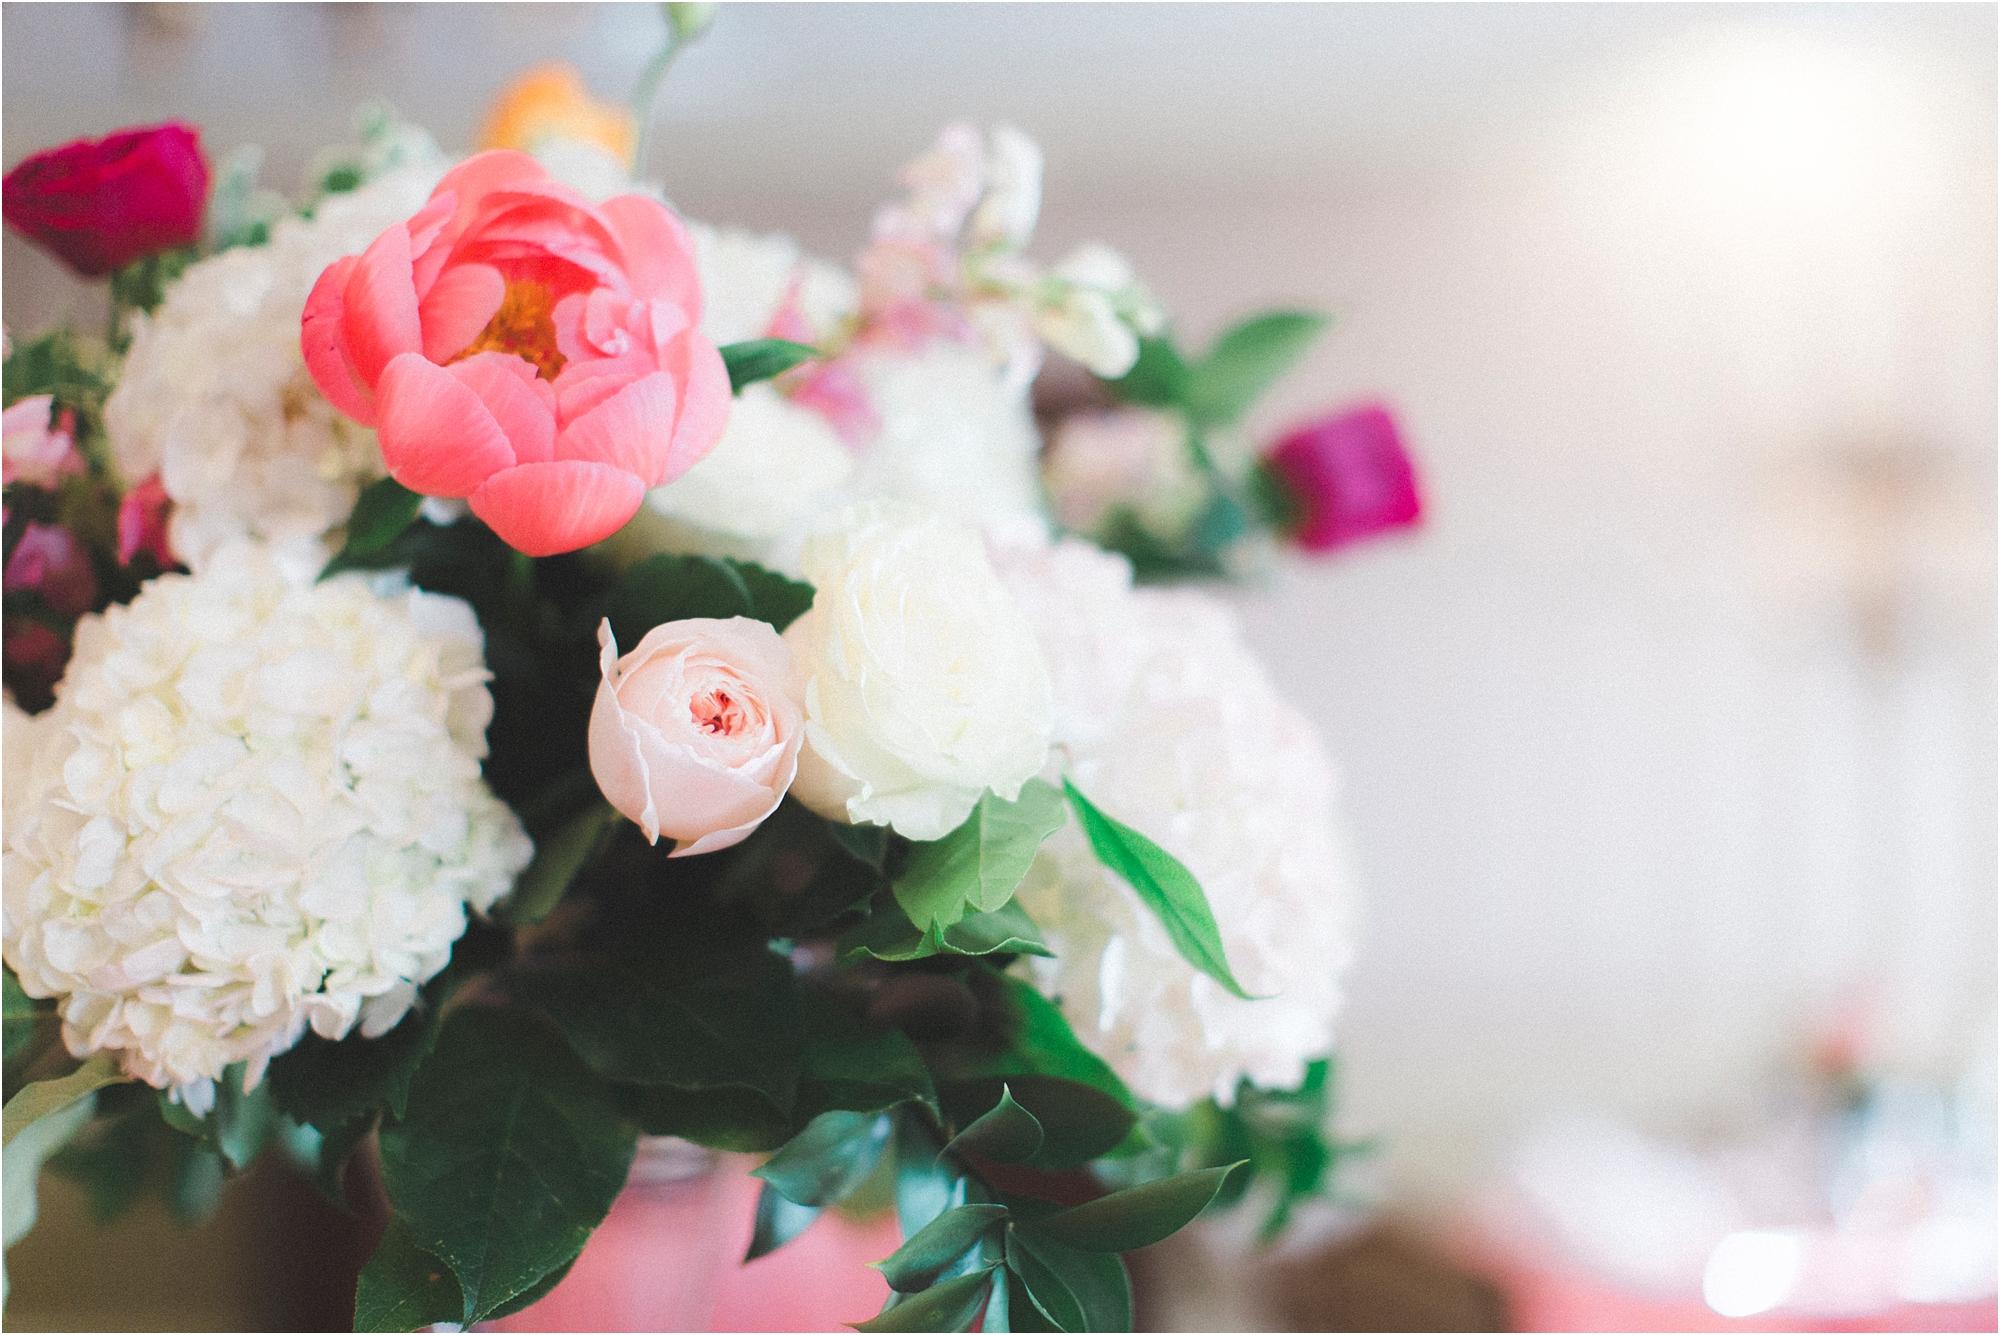 stephanie-yonce-photography-chic-historic-home-wedding-richmond-virginia-photos_0026.jpg